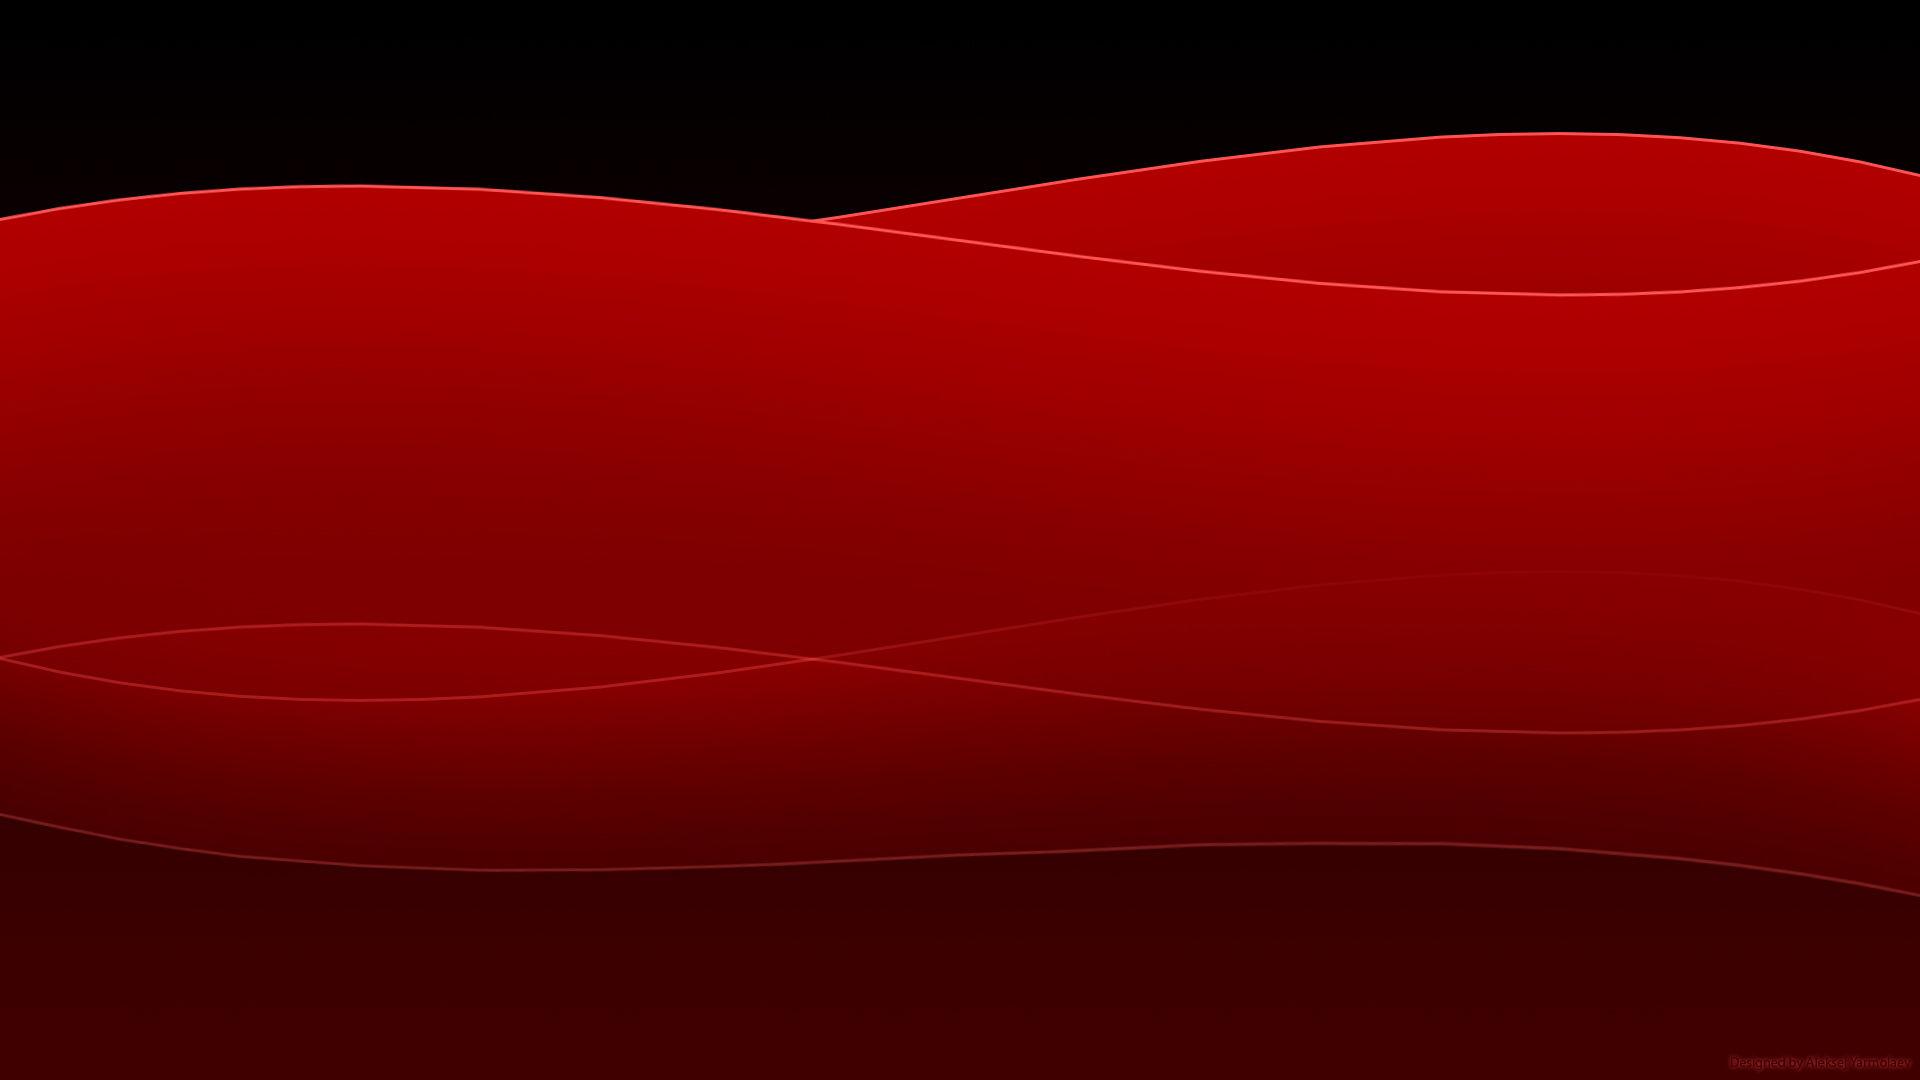 Red Wallpaper 014